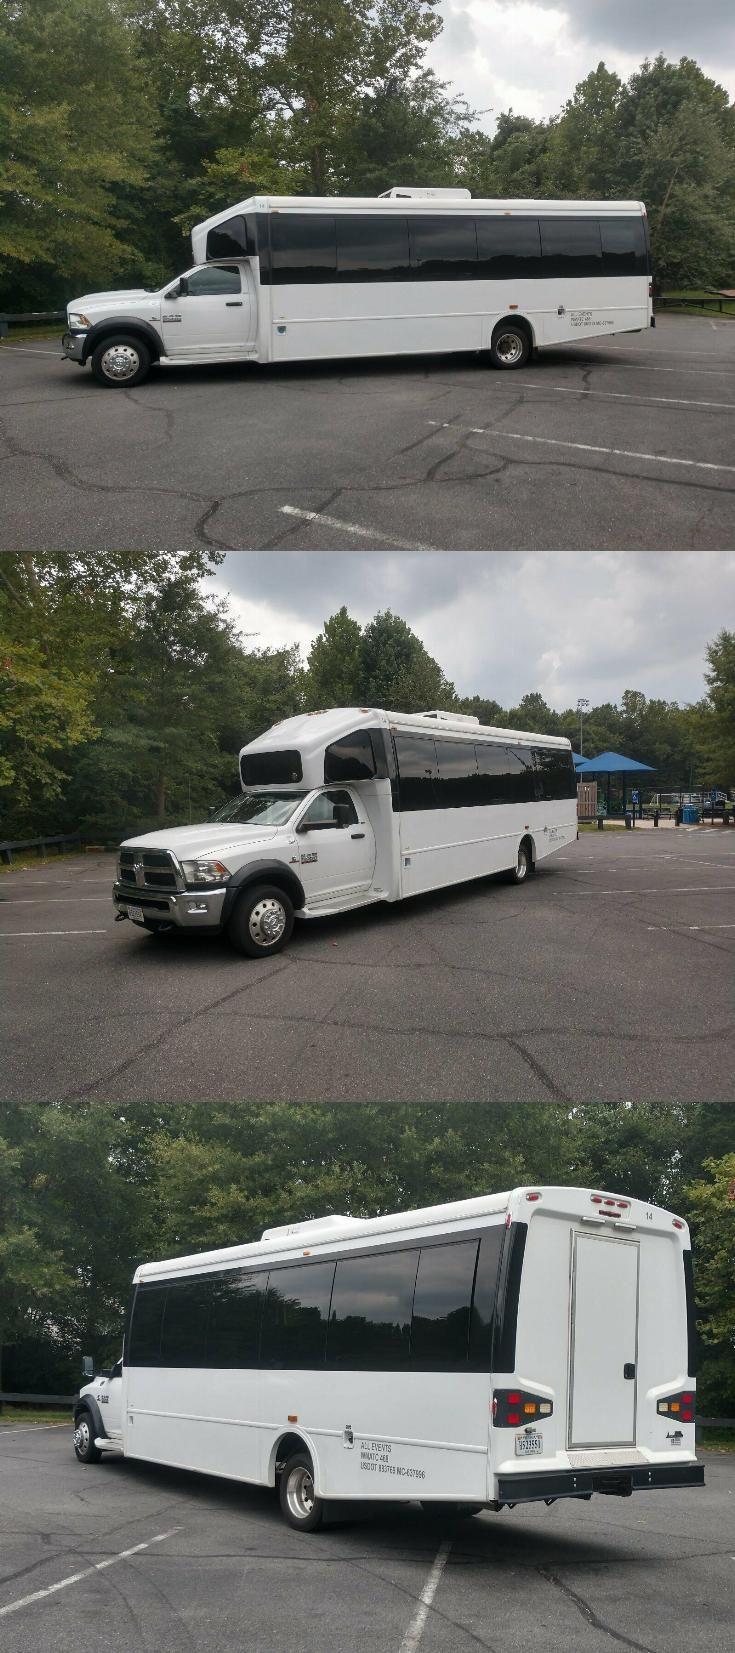 2013 Dodge Ram 5500 Charter bus, Church bus, Tour bus